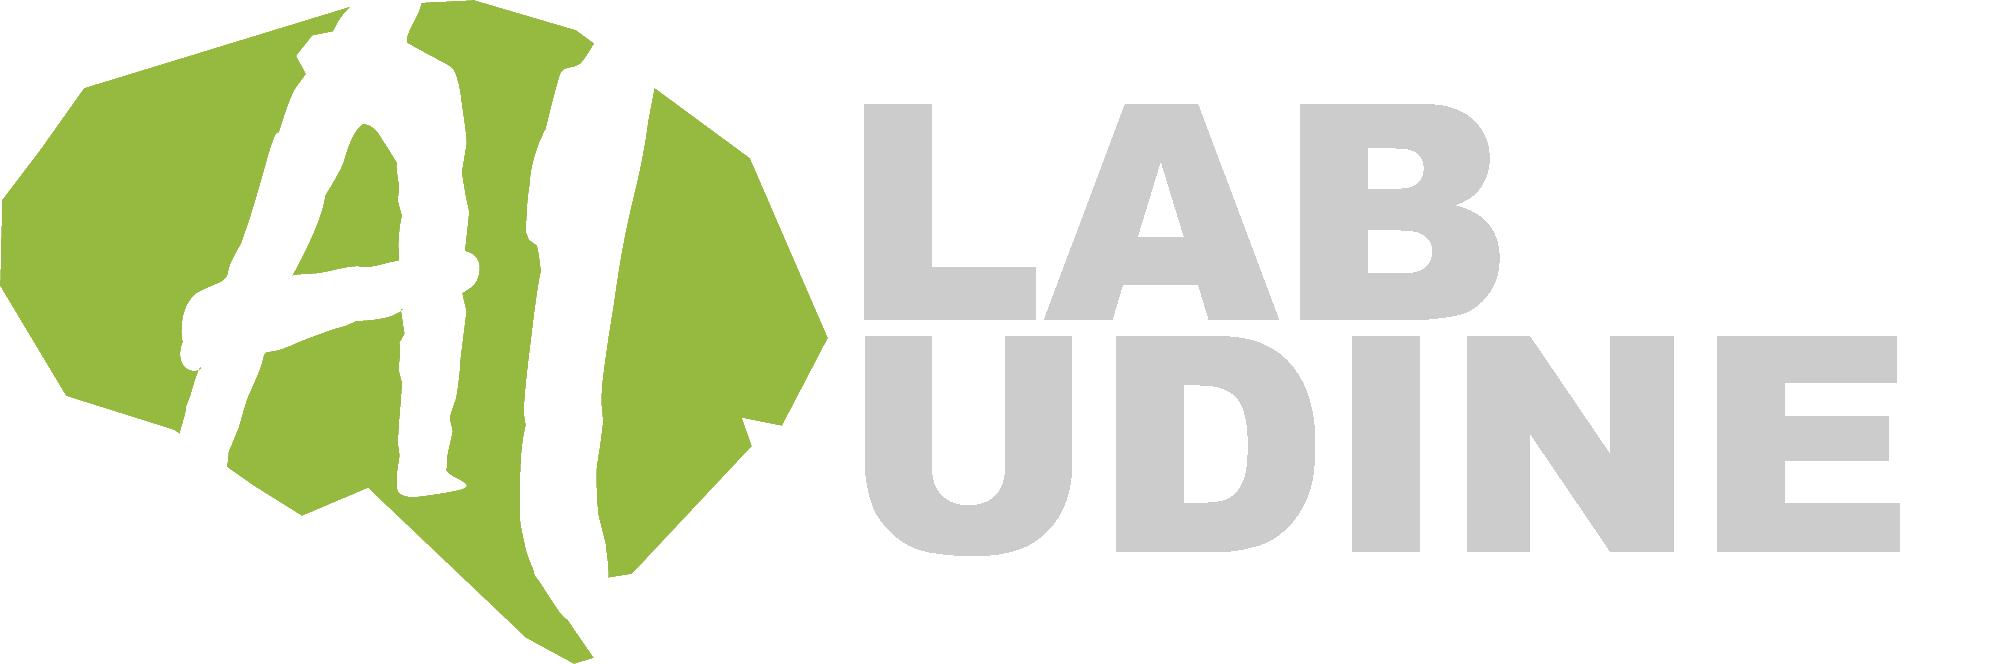 Logo of Artificial Intelligence Laboratory @ University of Udine